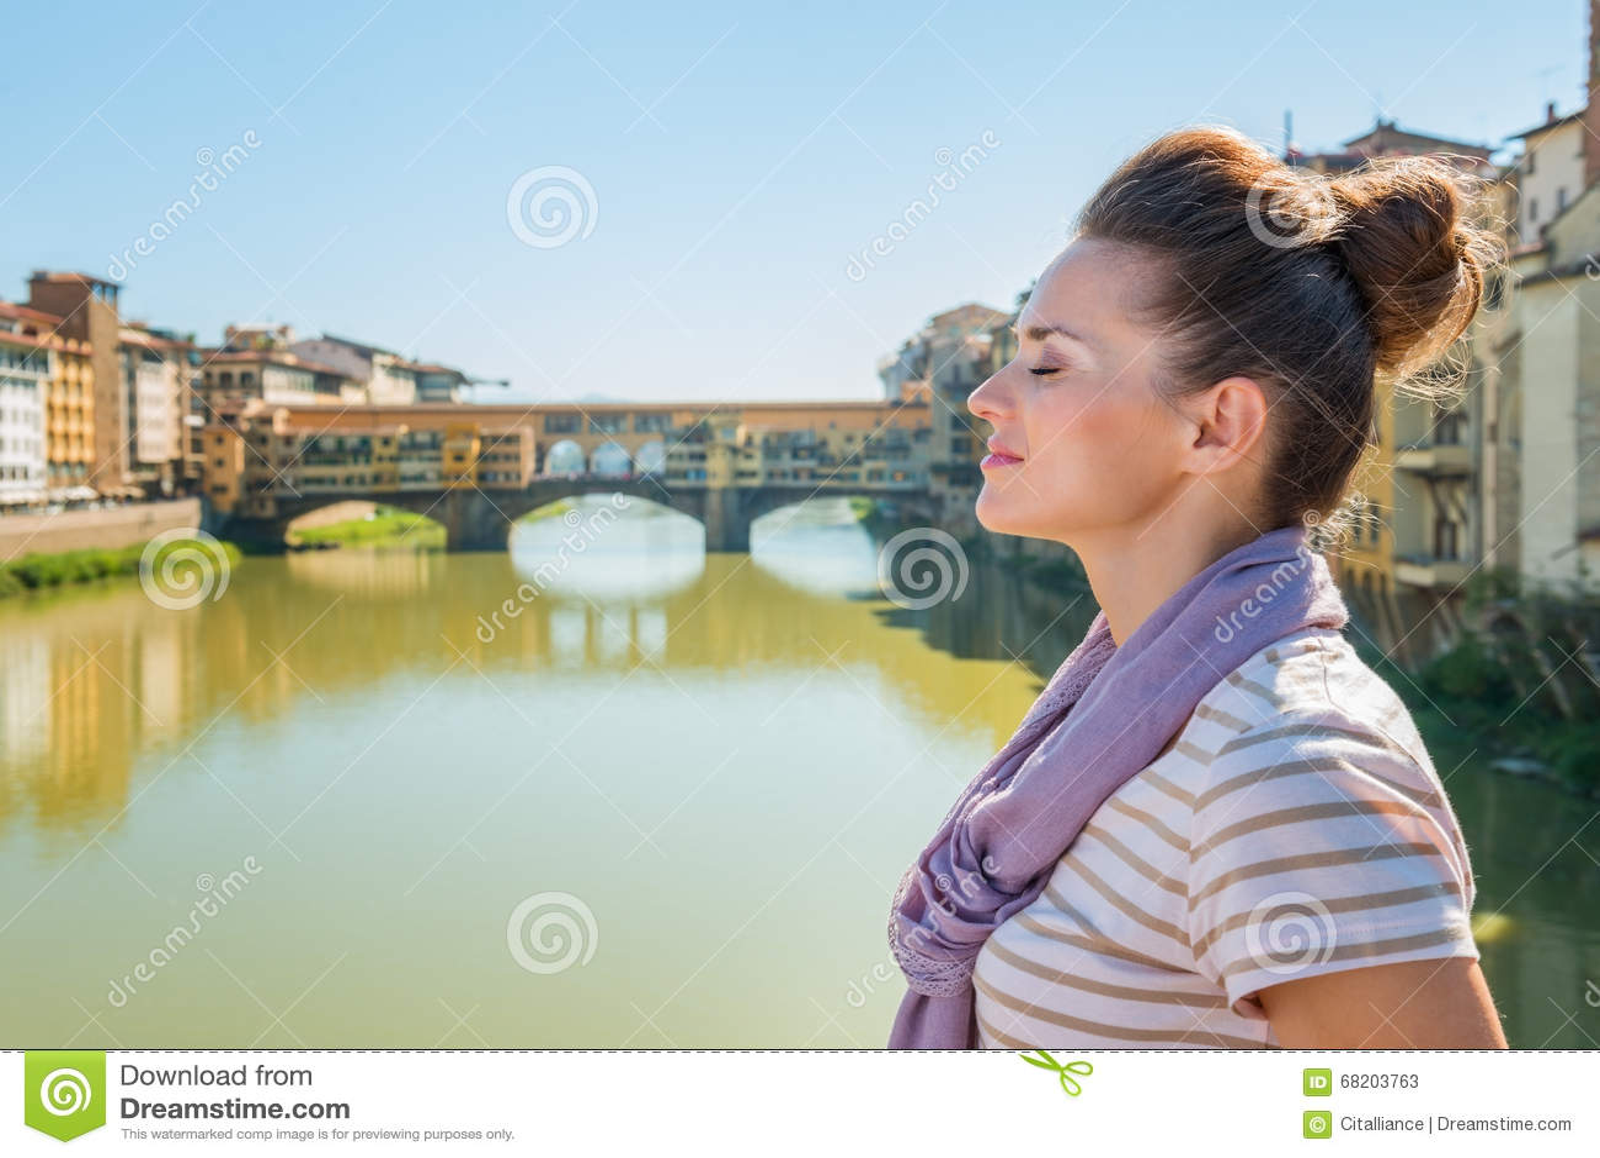 Relaxed tourist on bridge overlooking Ponte Vecchio, Florence